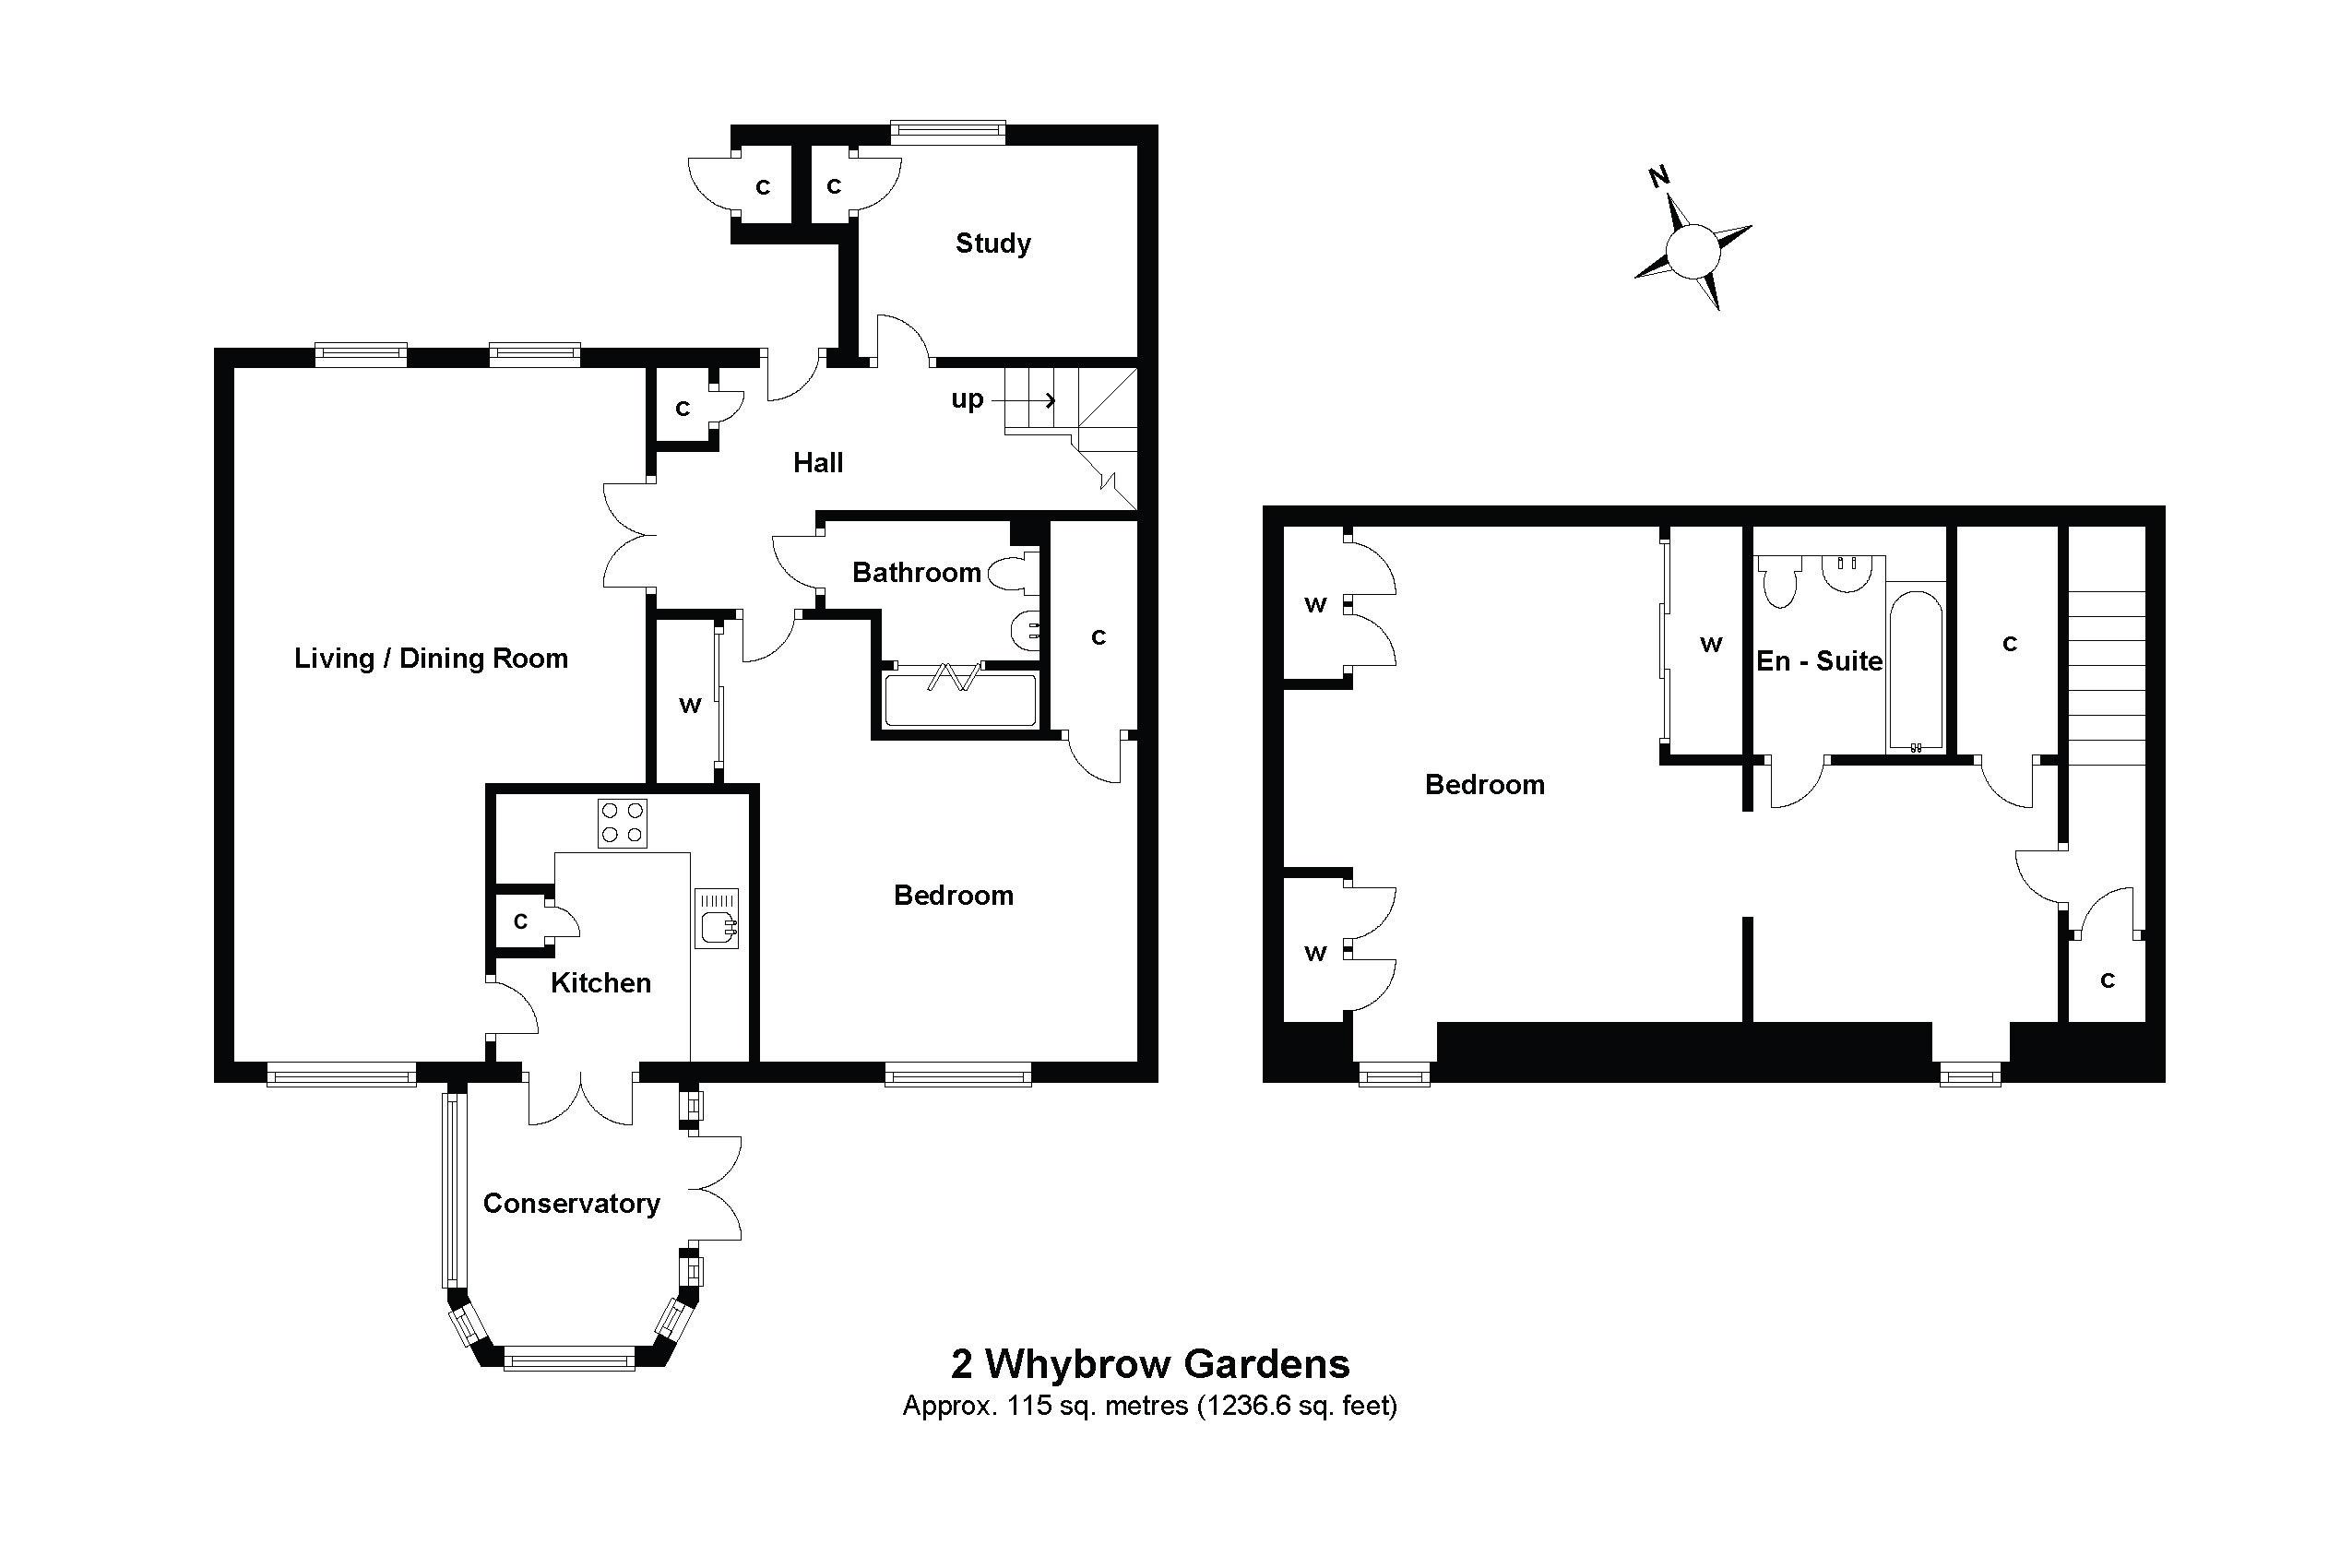 2 Whybrow Gardens Floorplan